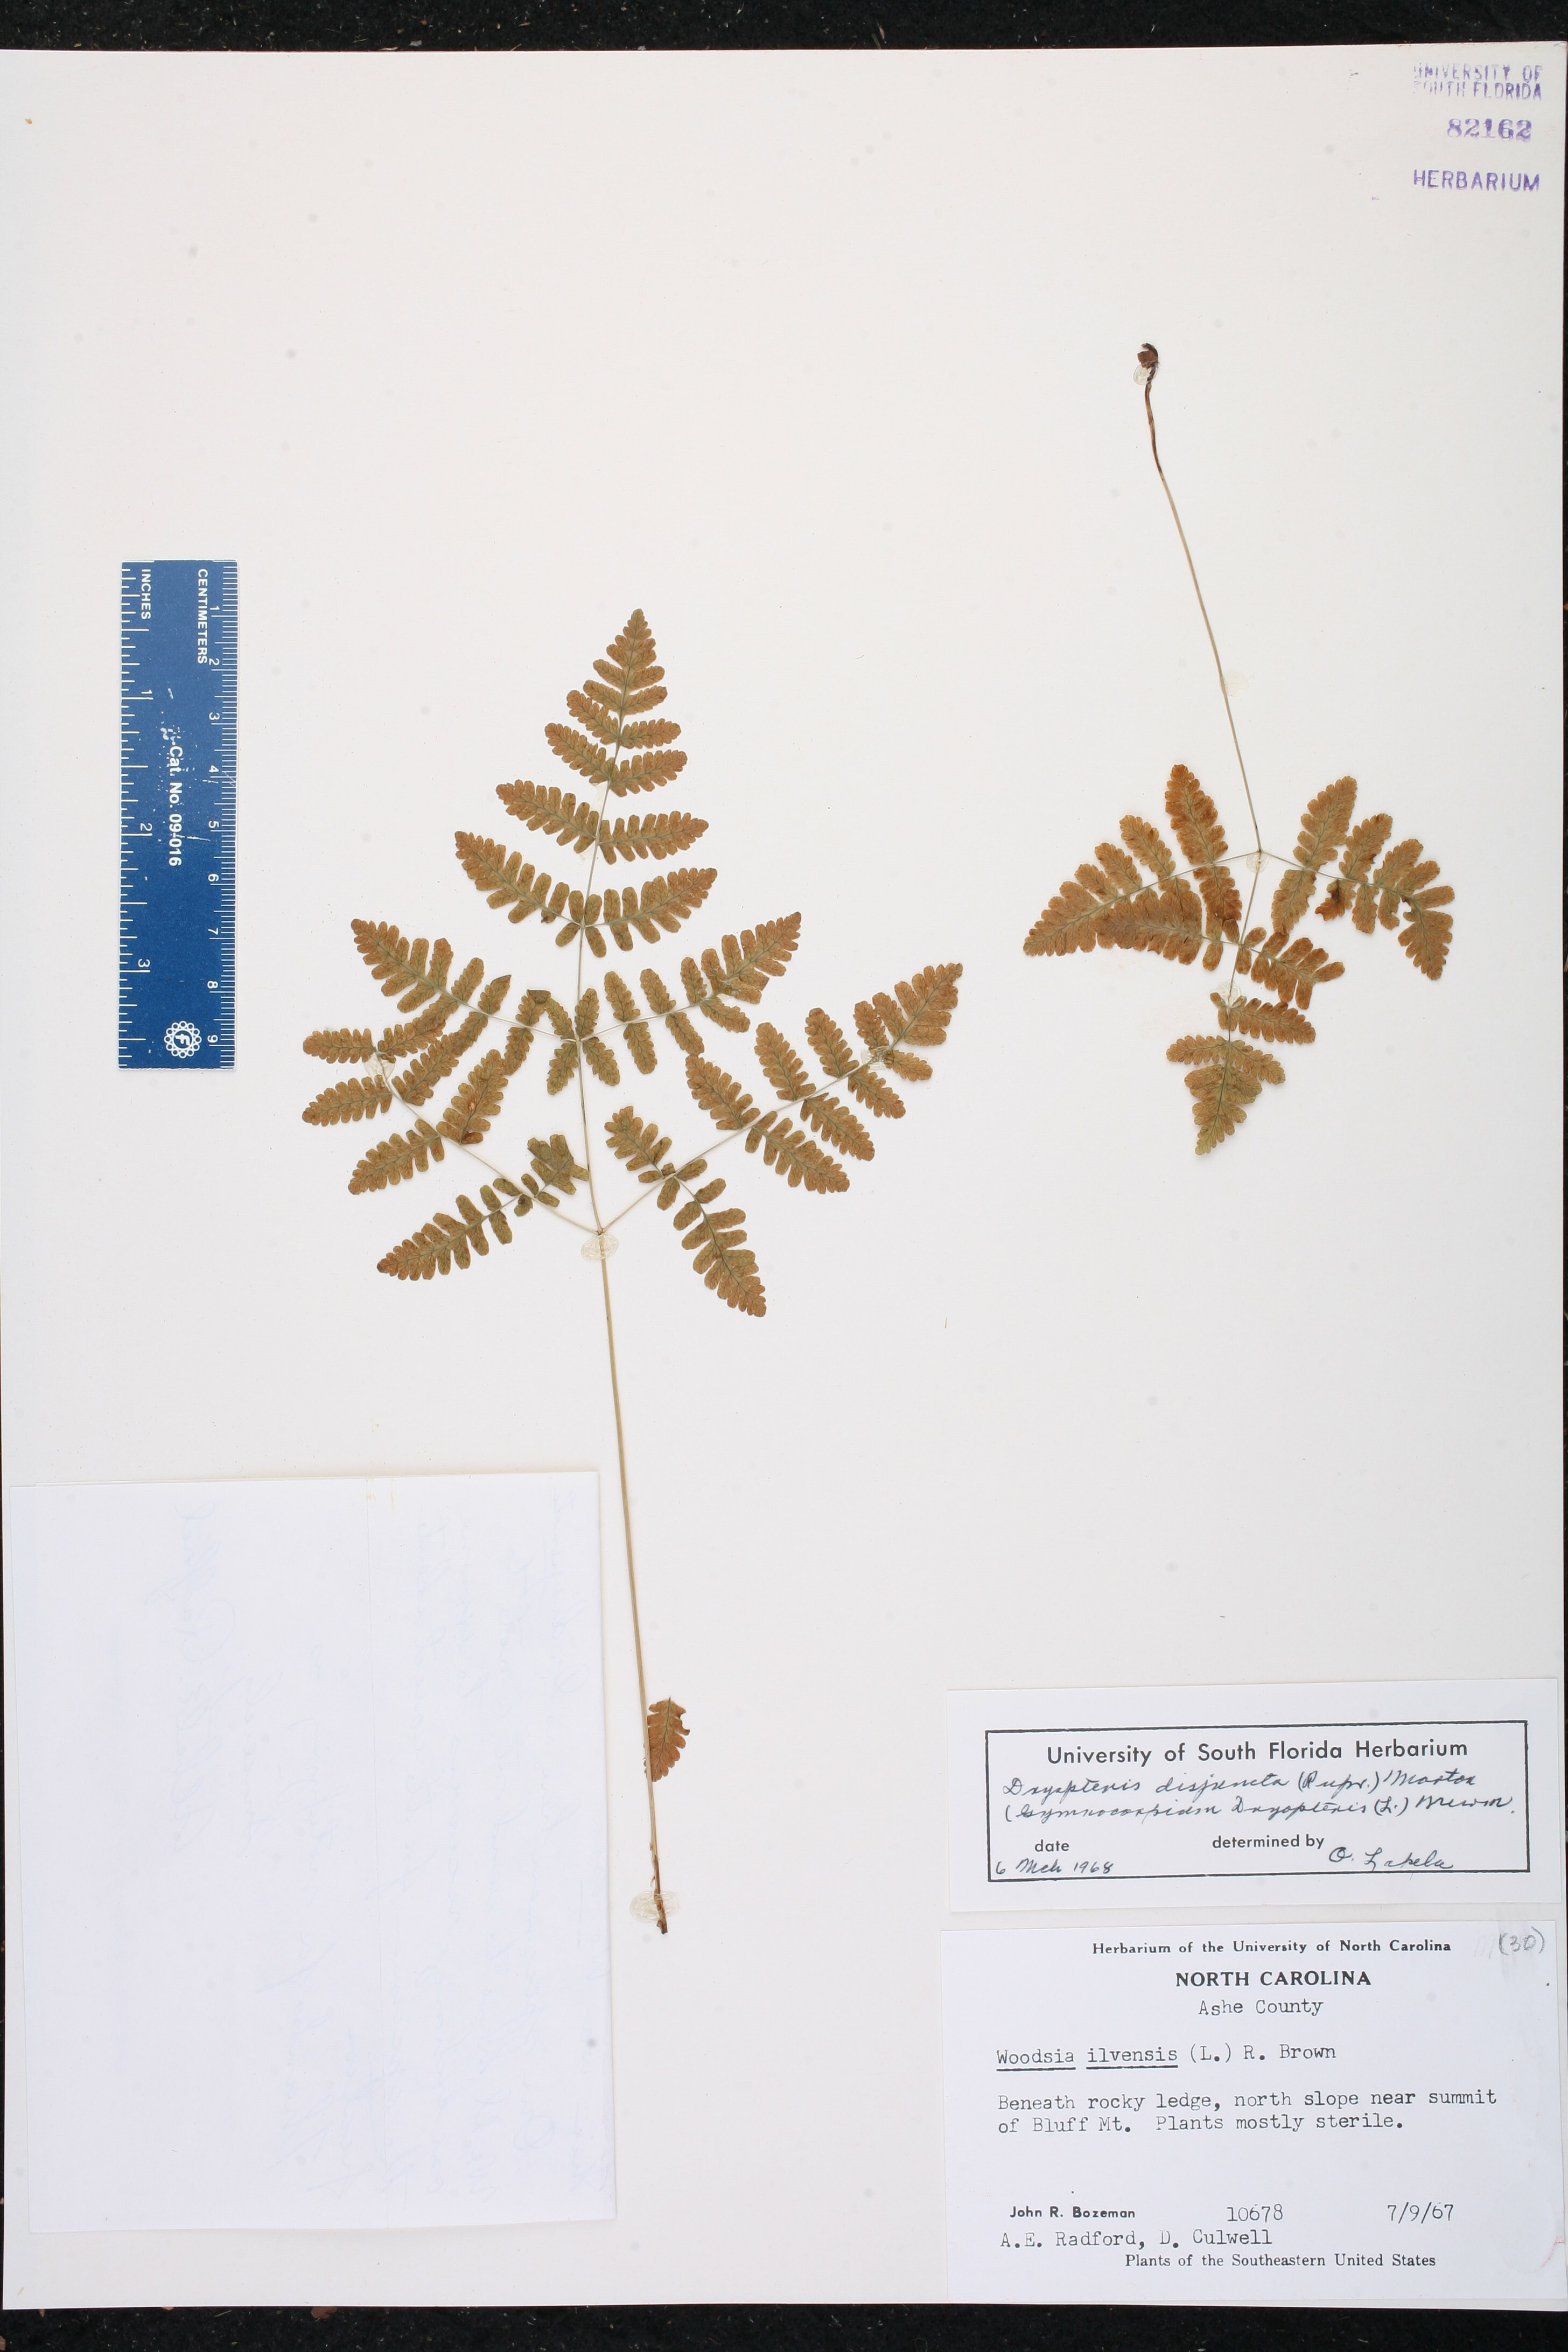 Dryopteris disjuncta image